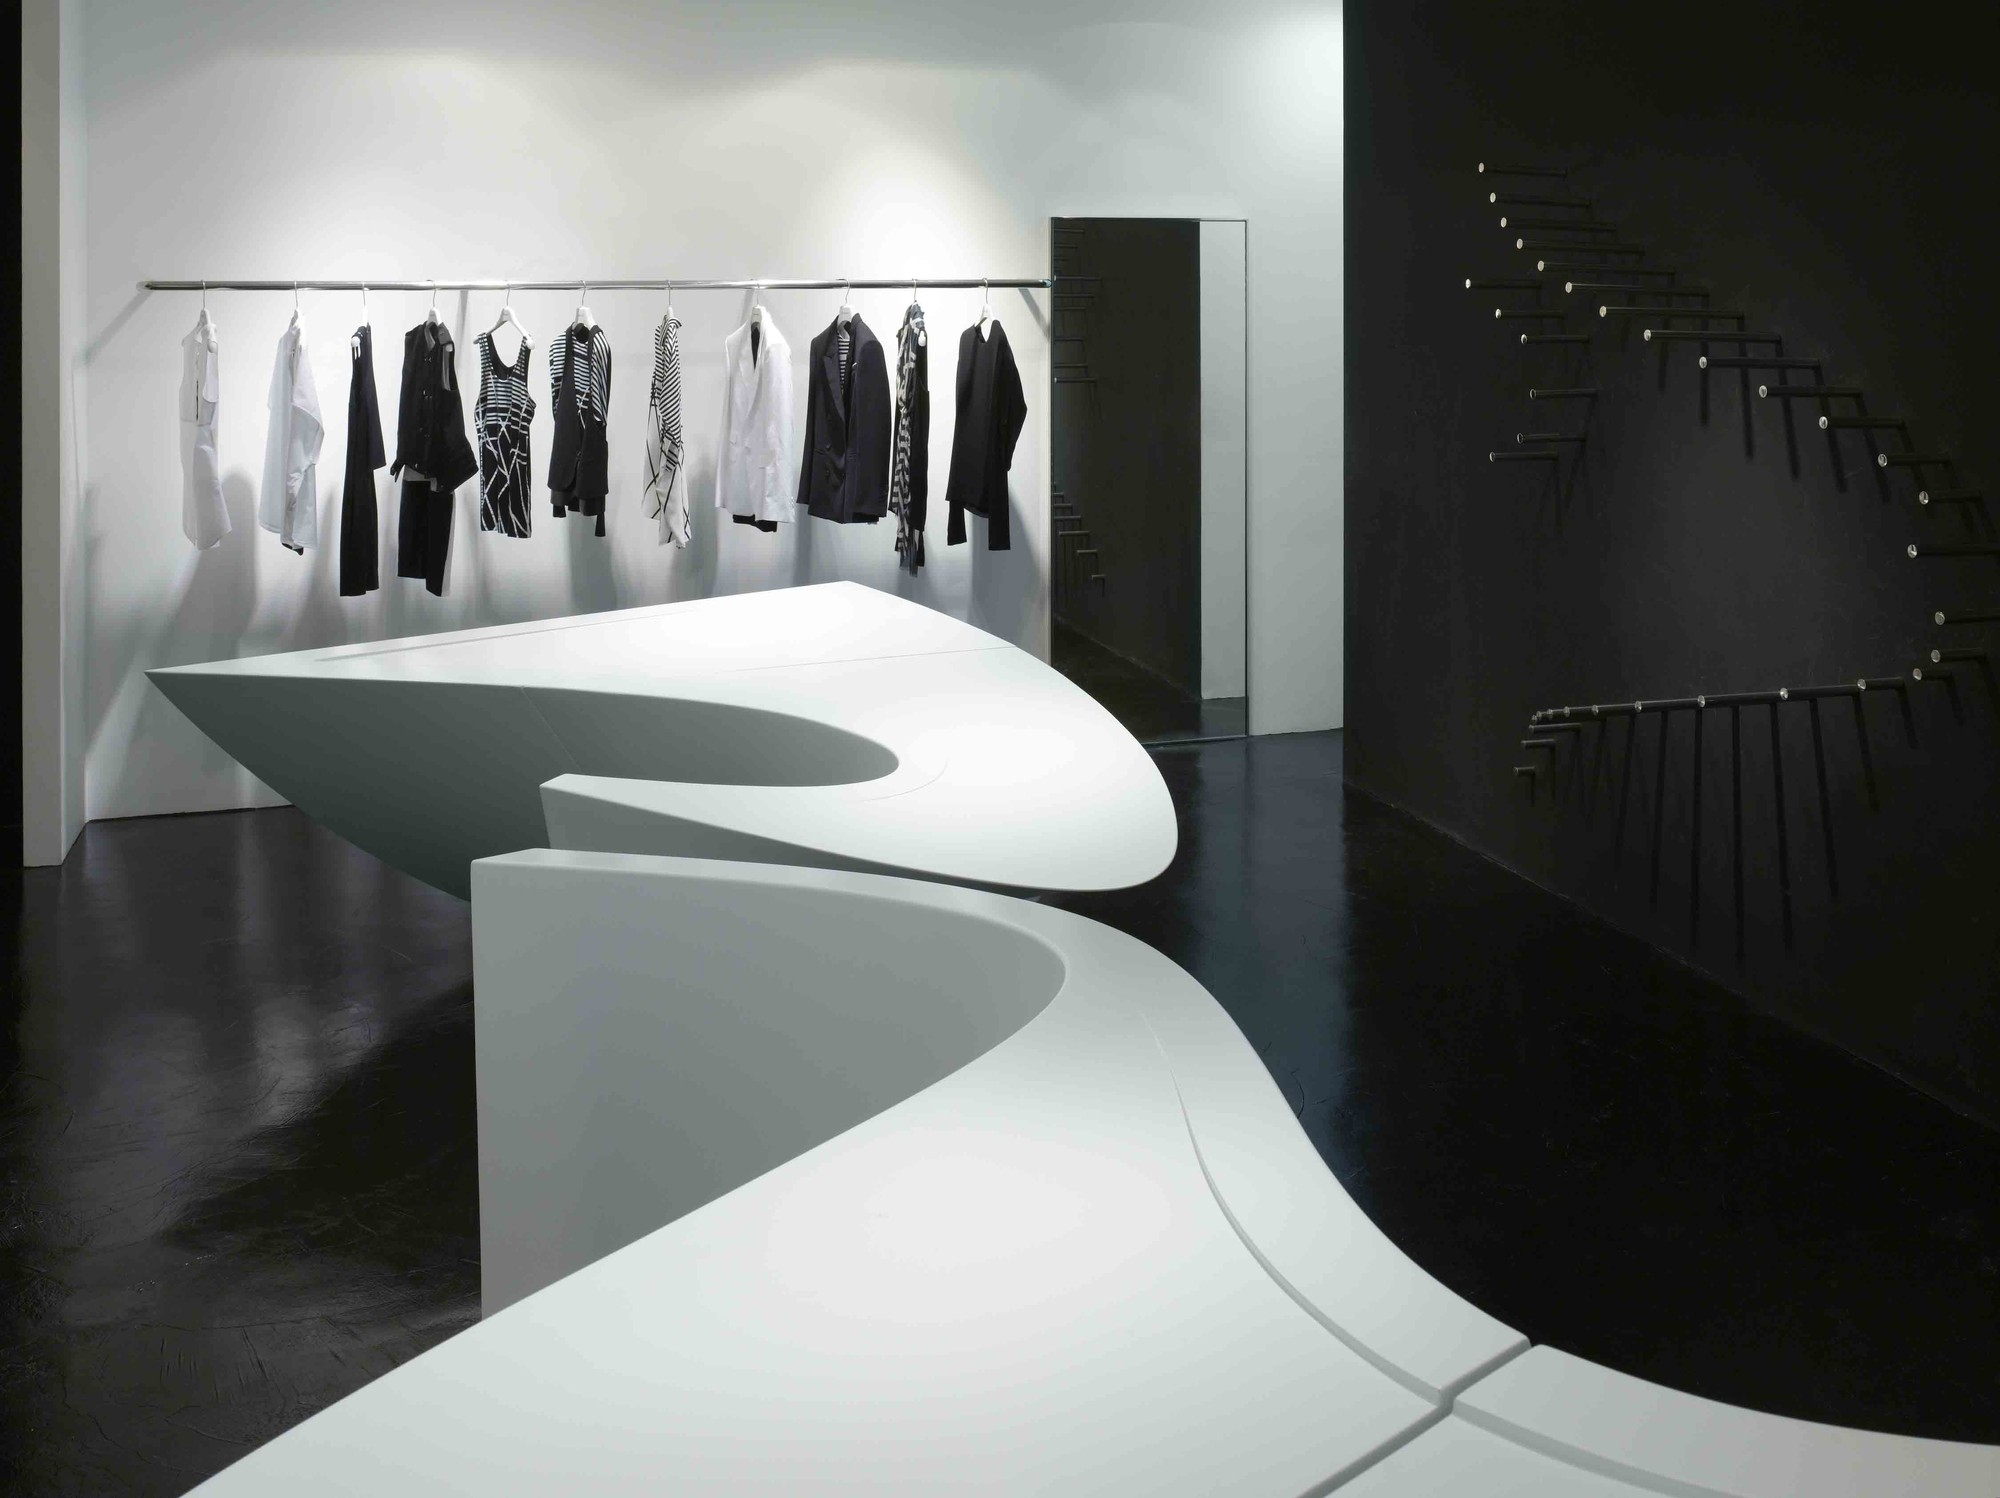 Gallery Of Neil Barrett 39 Shop In Shop 39 Zaha Hadid